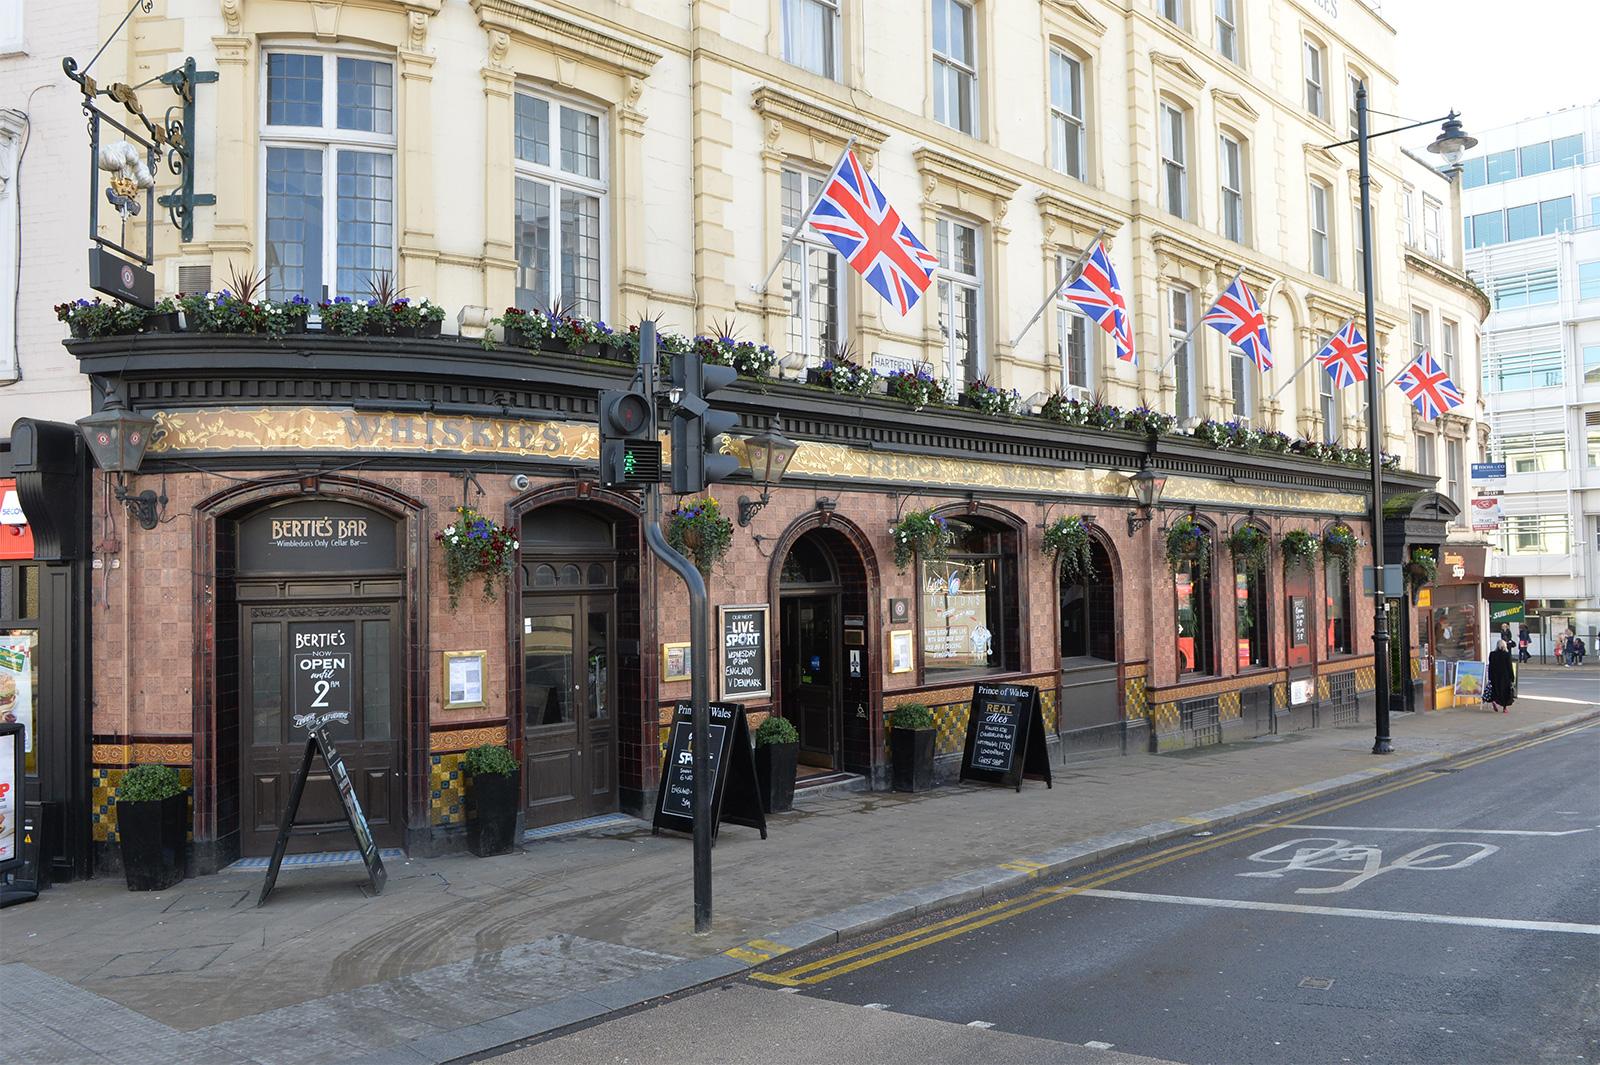 Wimbledon's Prince of Wales pub